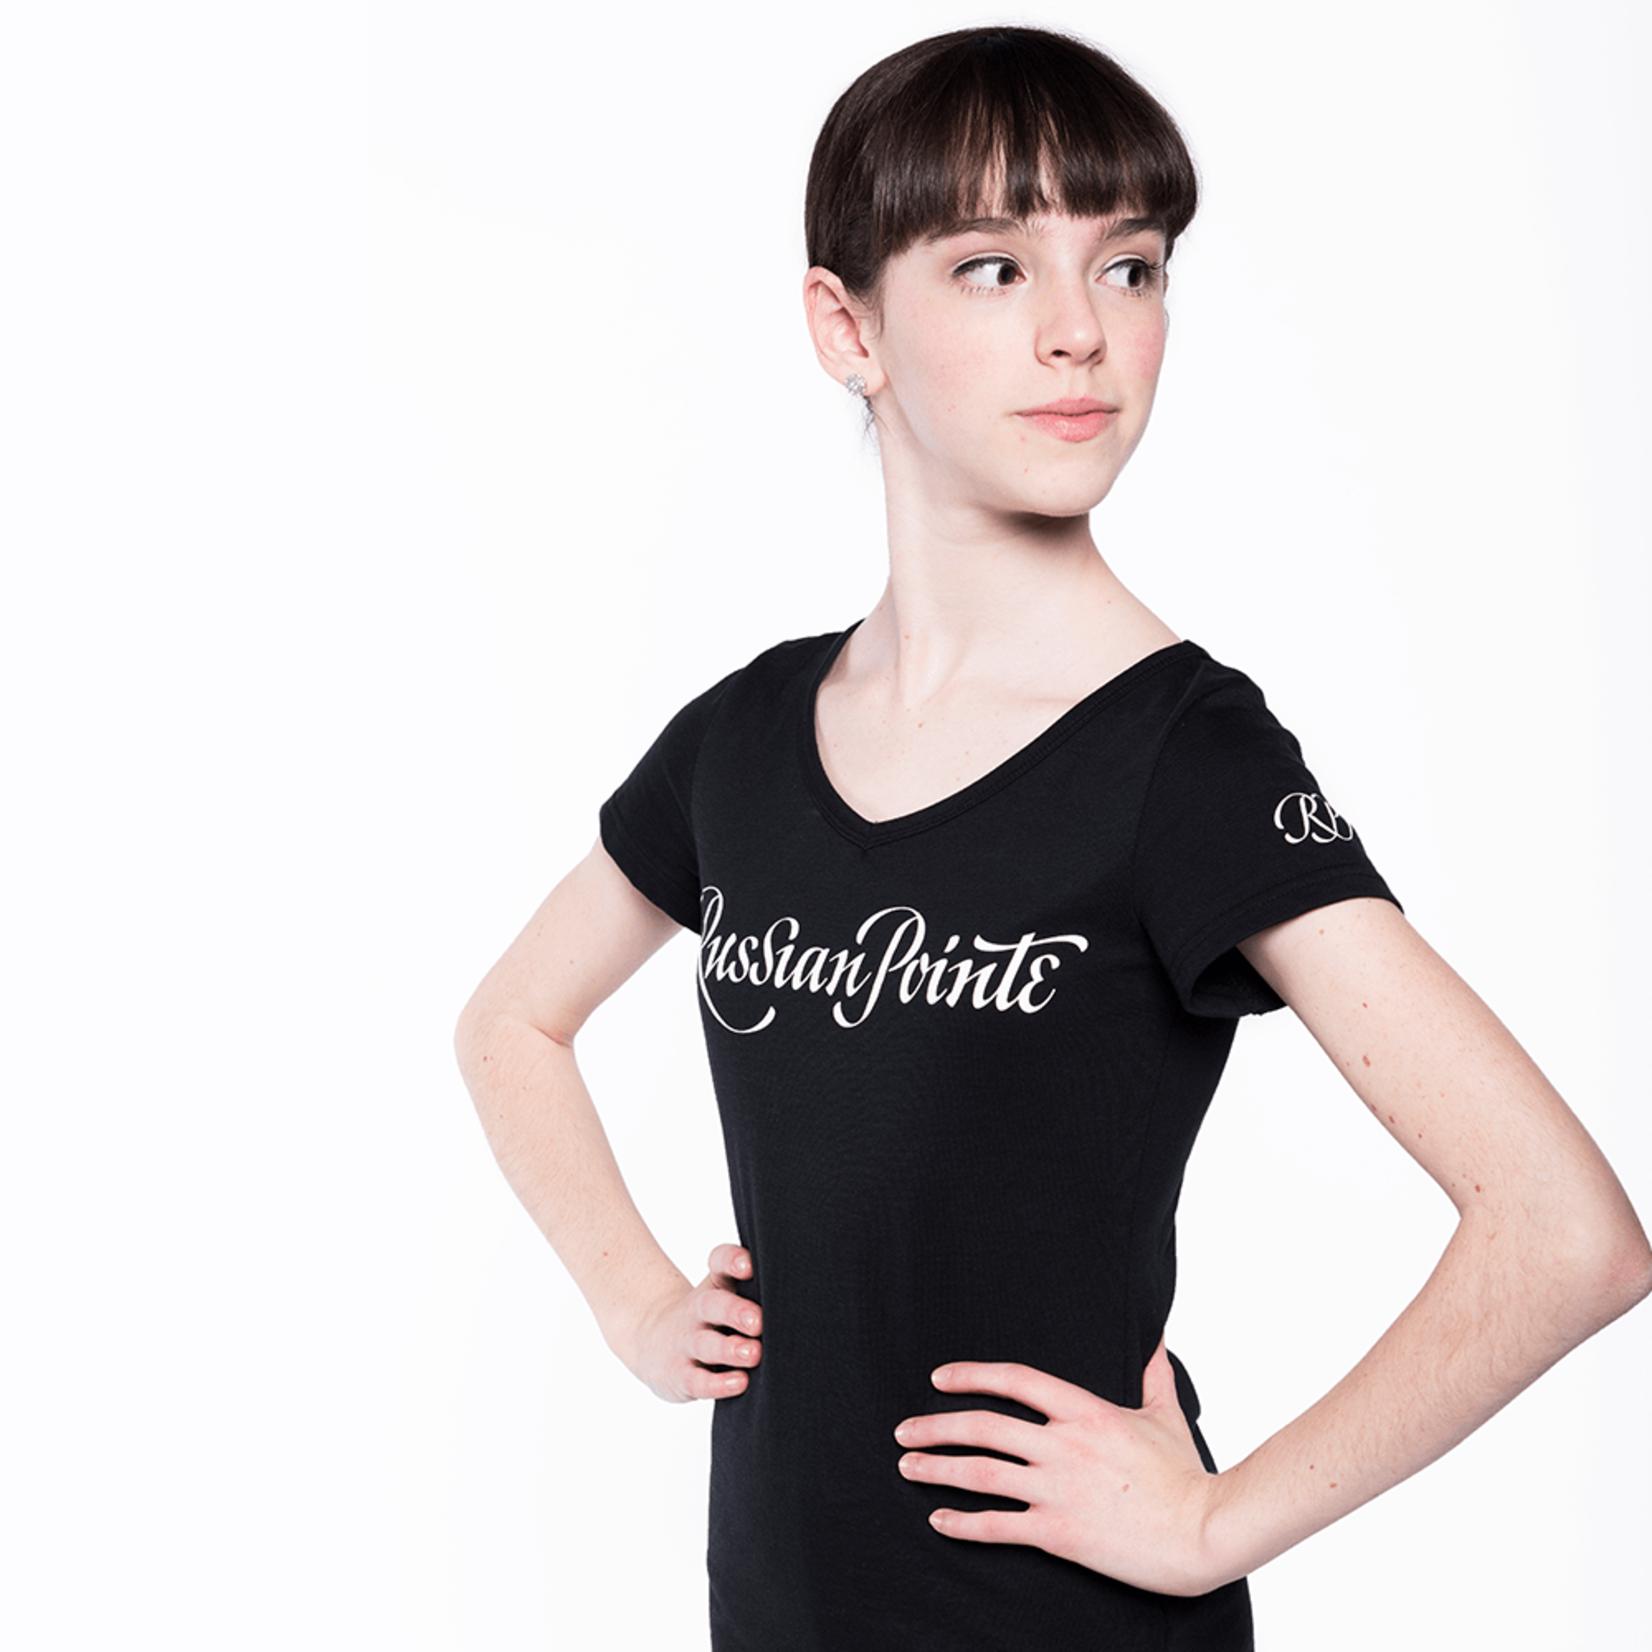 Russian Pointe Russian Pointe Logo T-Shirt